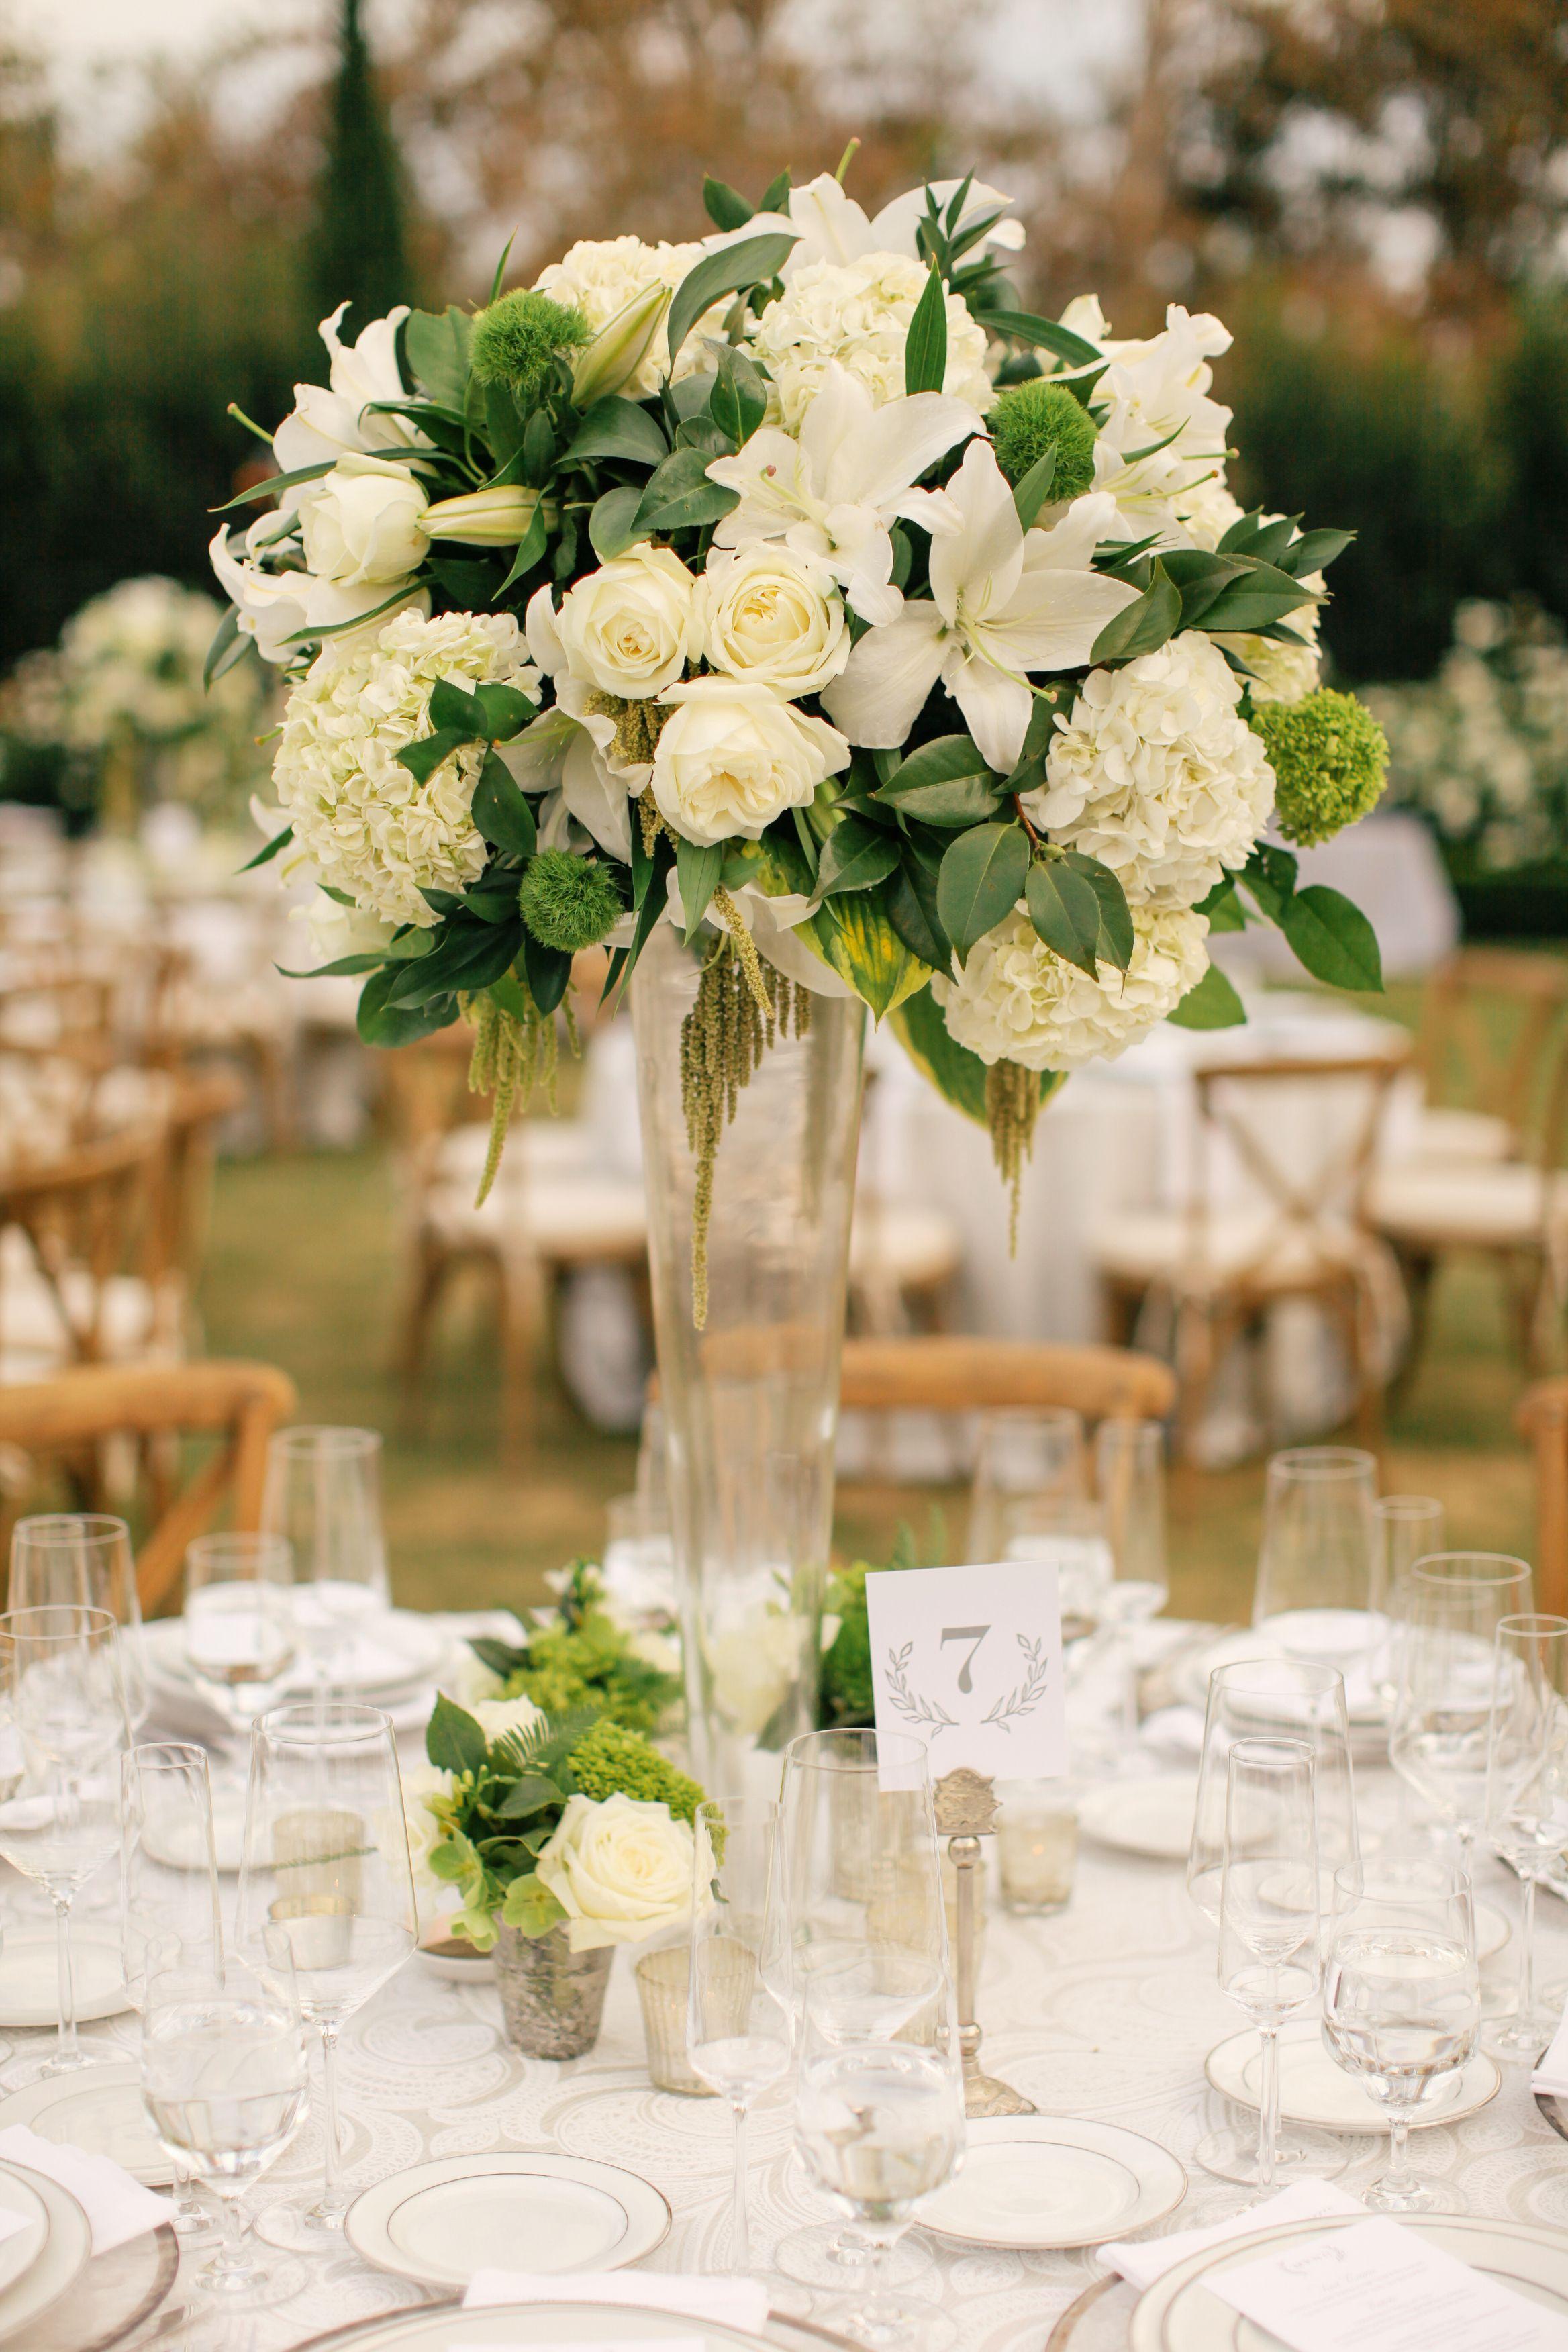 White And Black Elegant Wedding White roses wedding